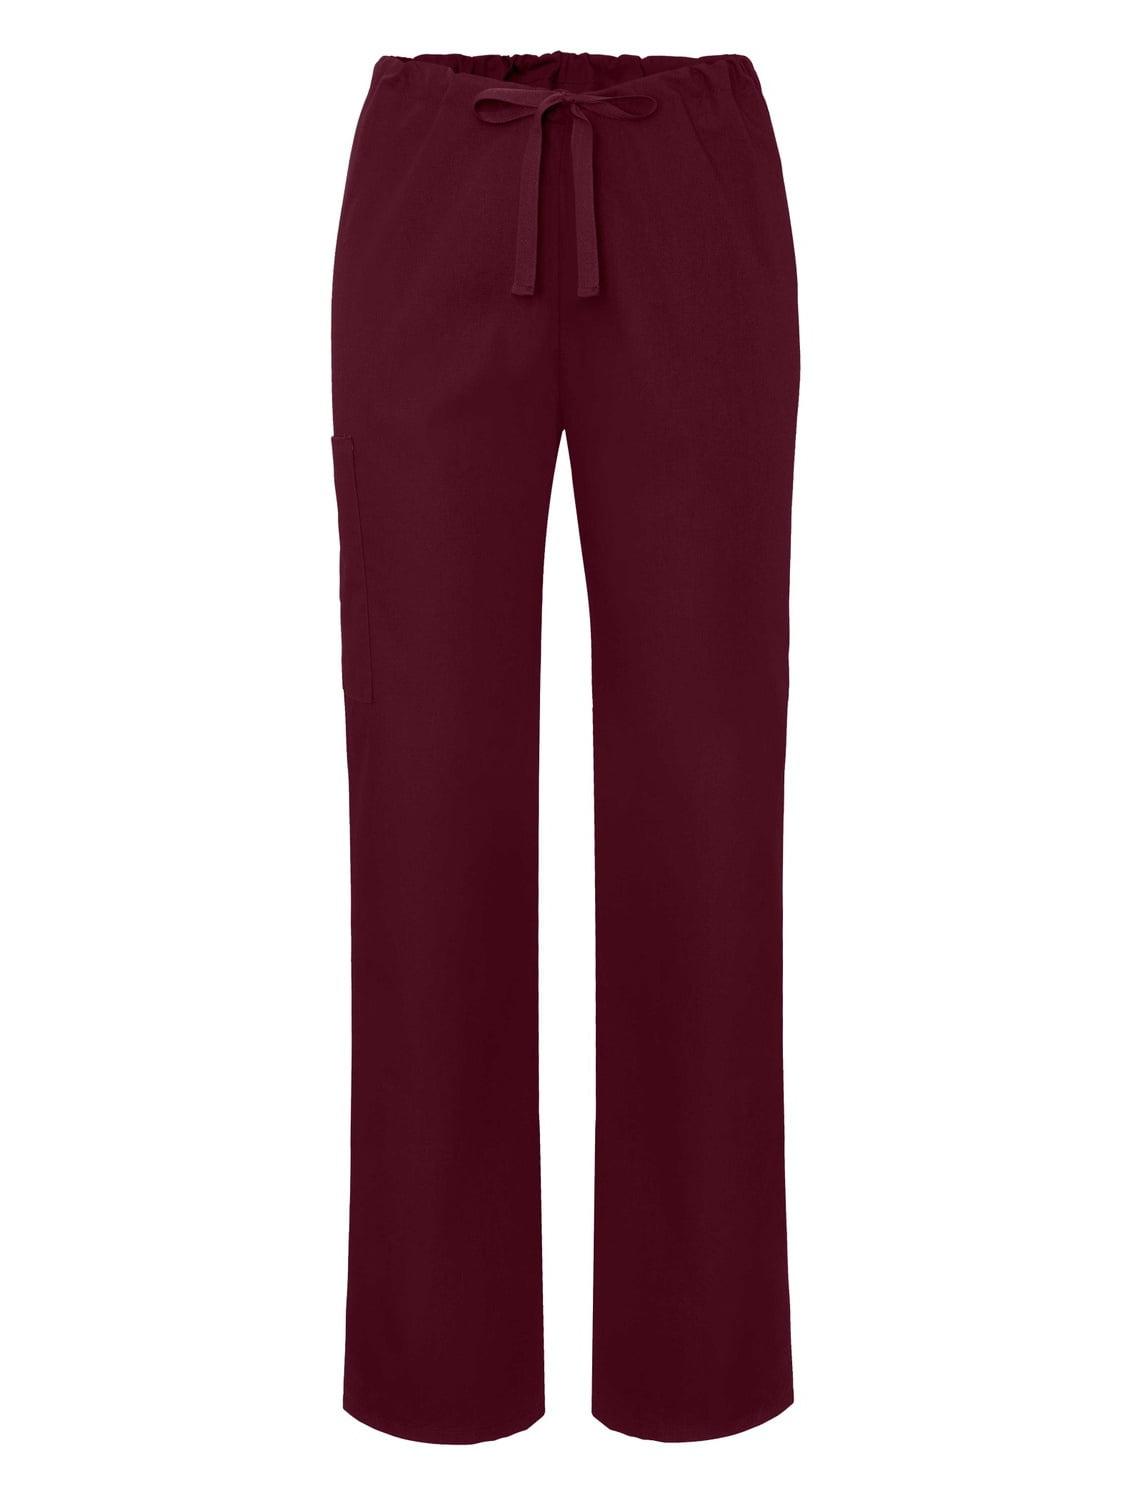 Adar Universal Unisex Natural-Rise Drawstring Tapered Leg Pants Petite - 504P - Geranium - XL